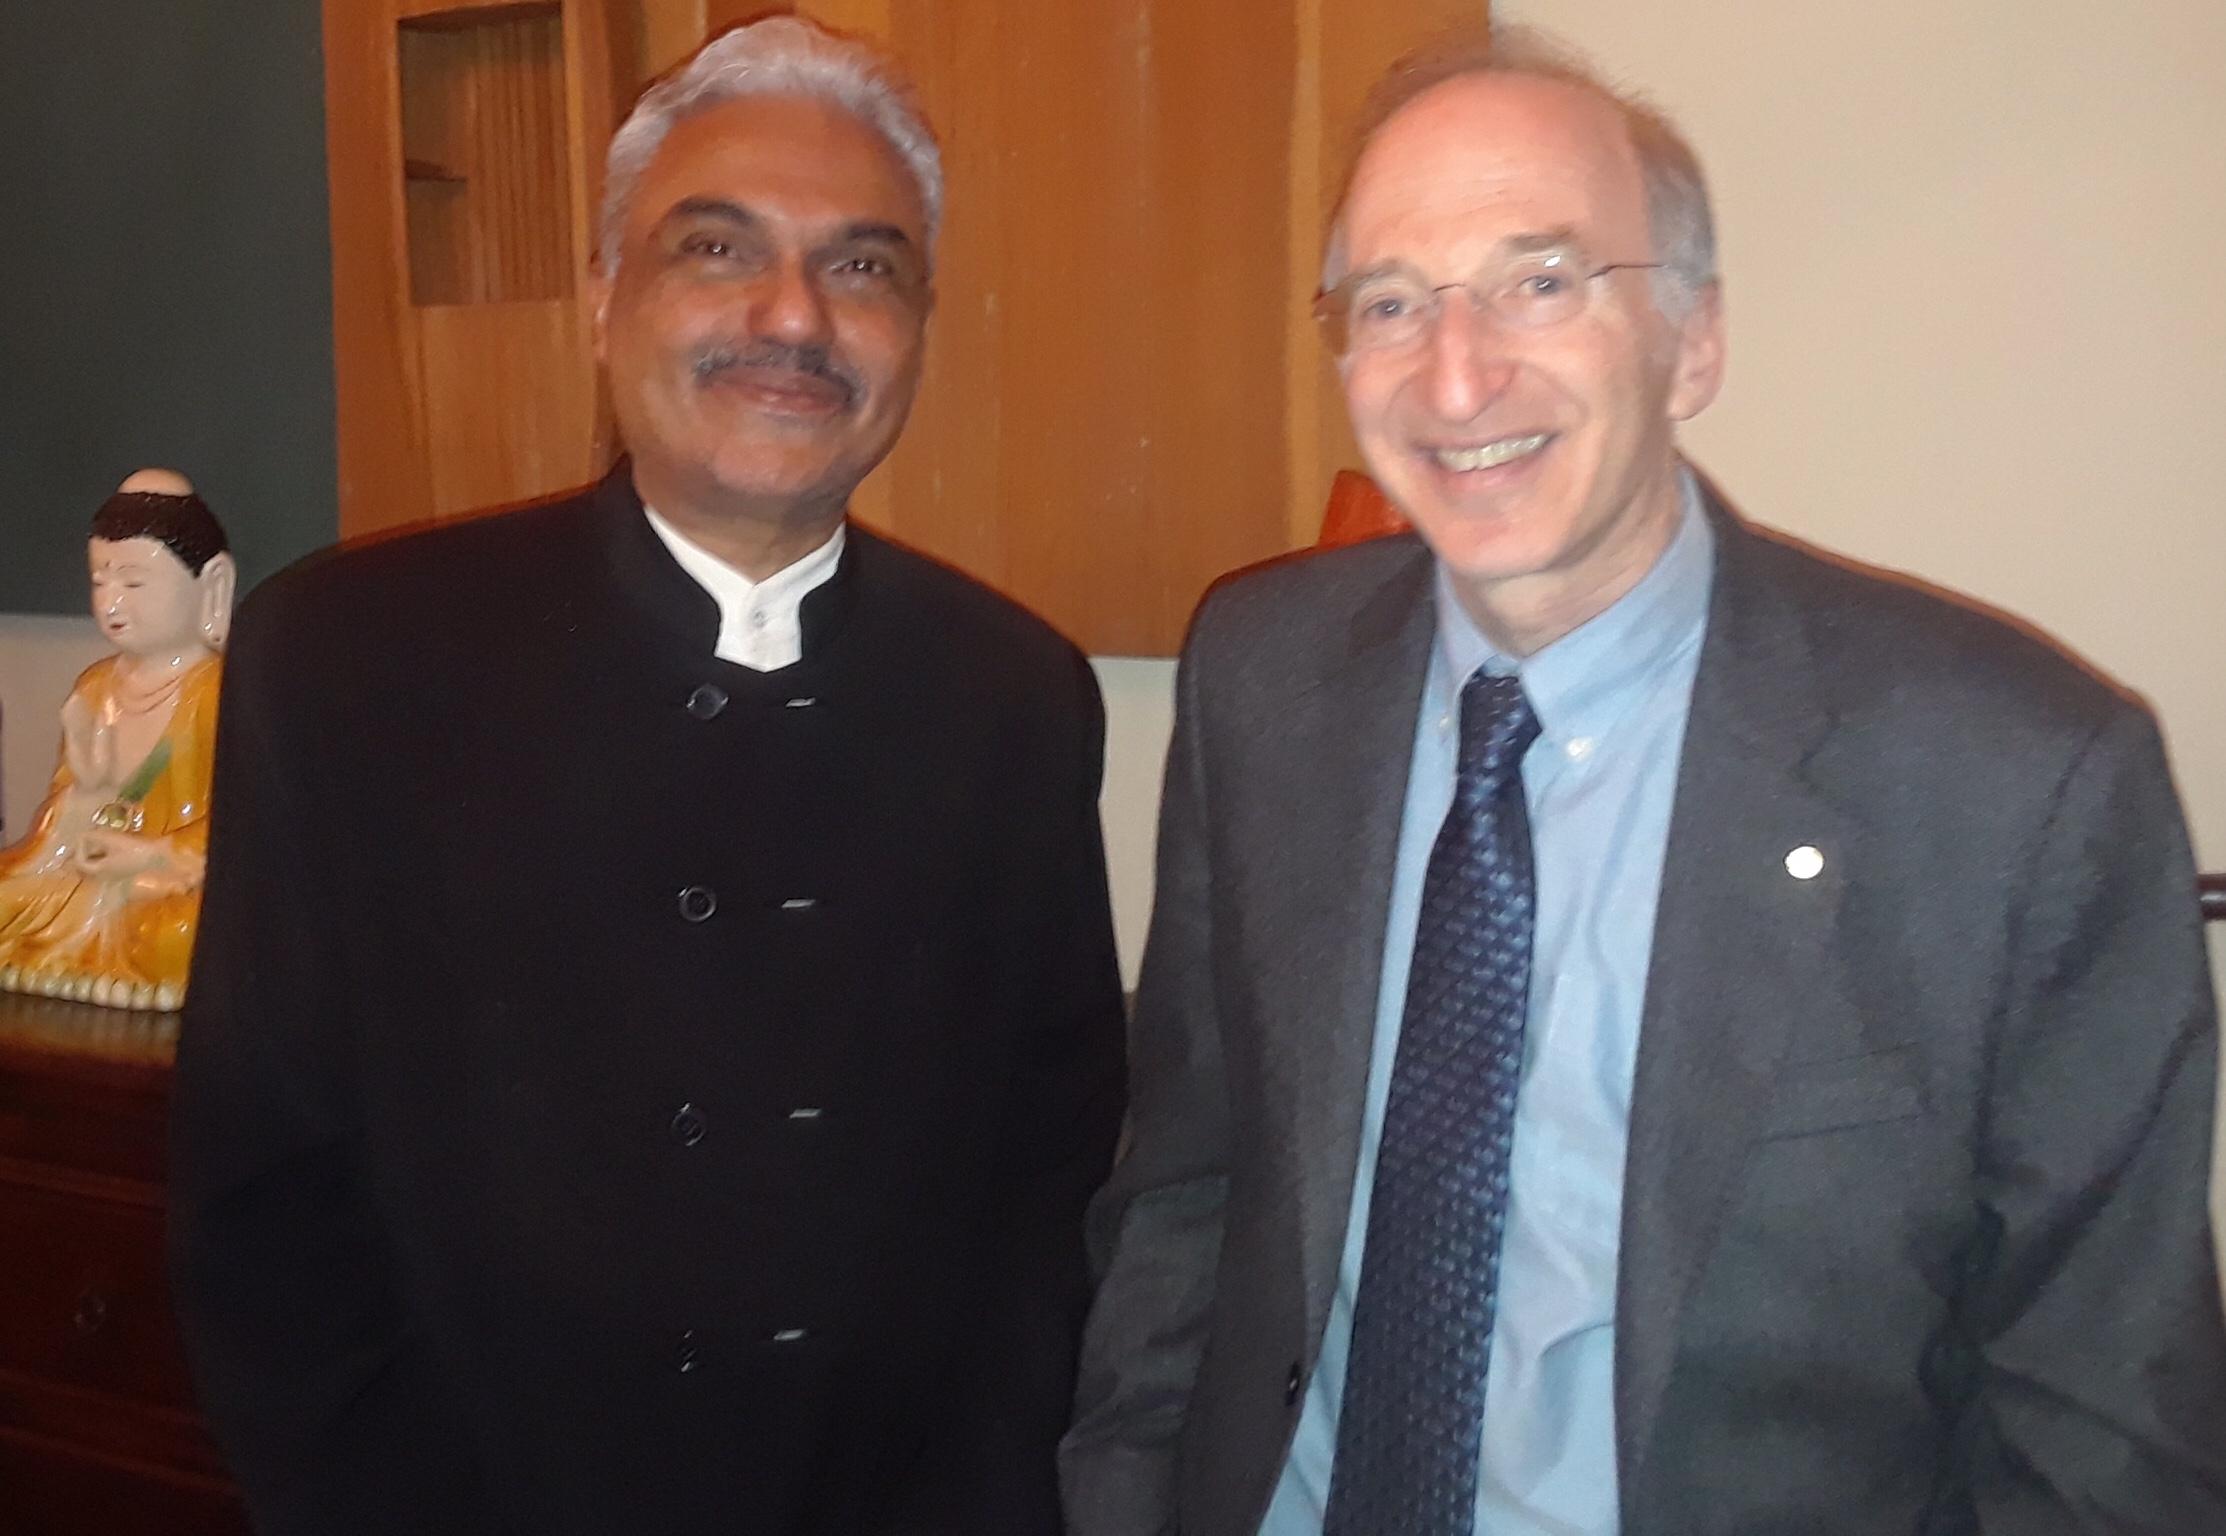 Photo: George Pinto with Nobel Prize winner Prof. Brian Kobilka (Chemistry, 2012)